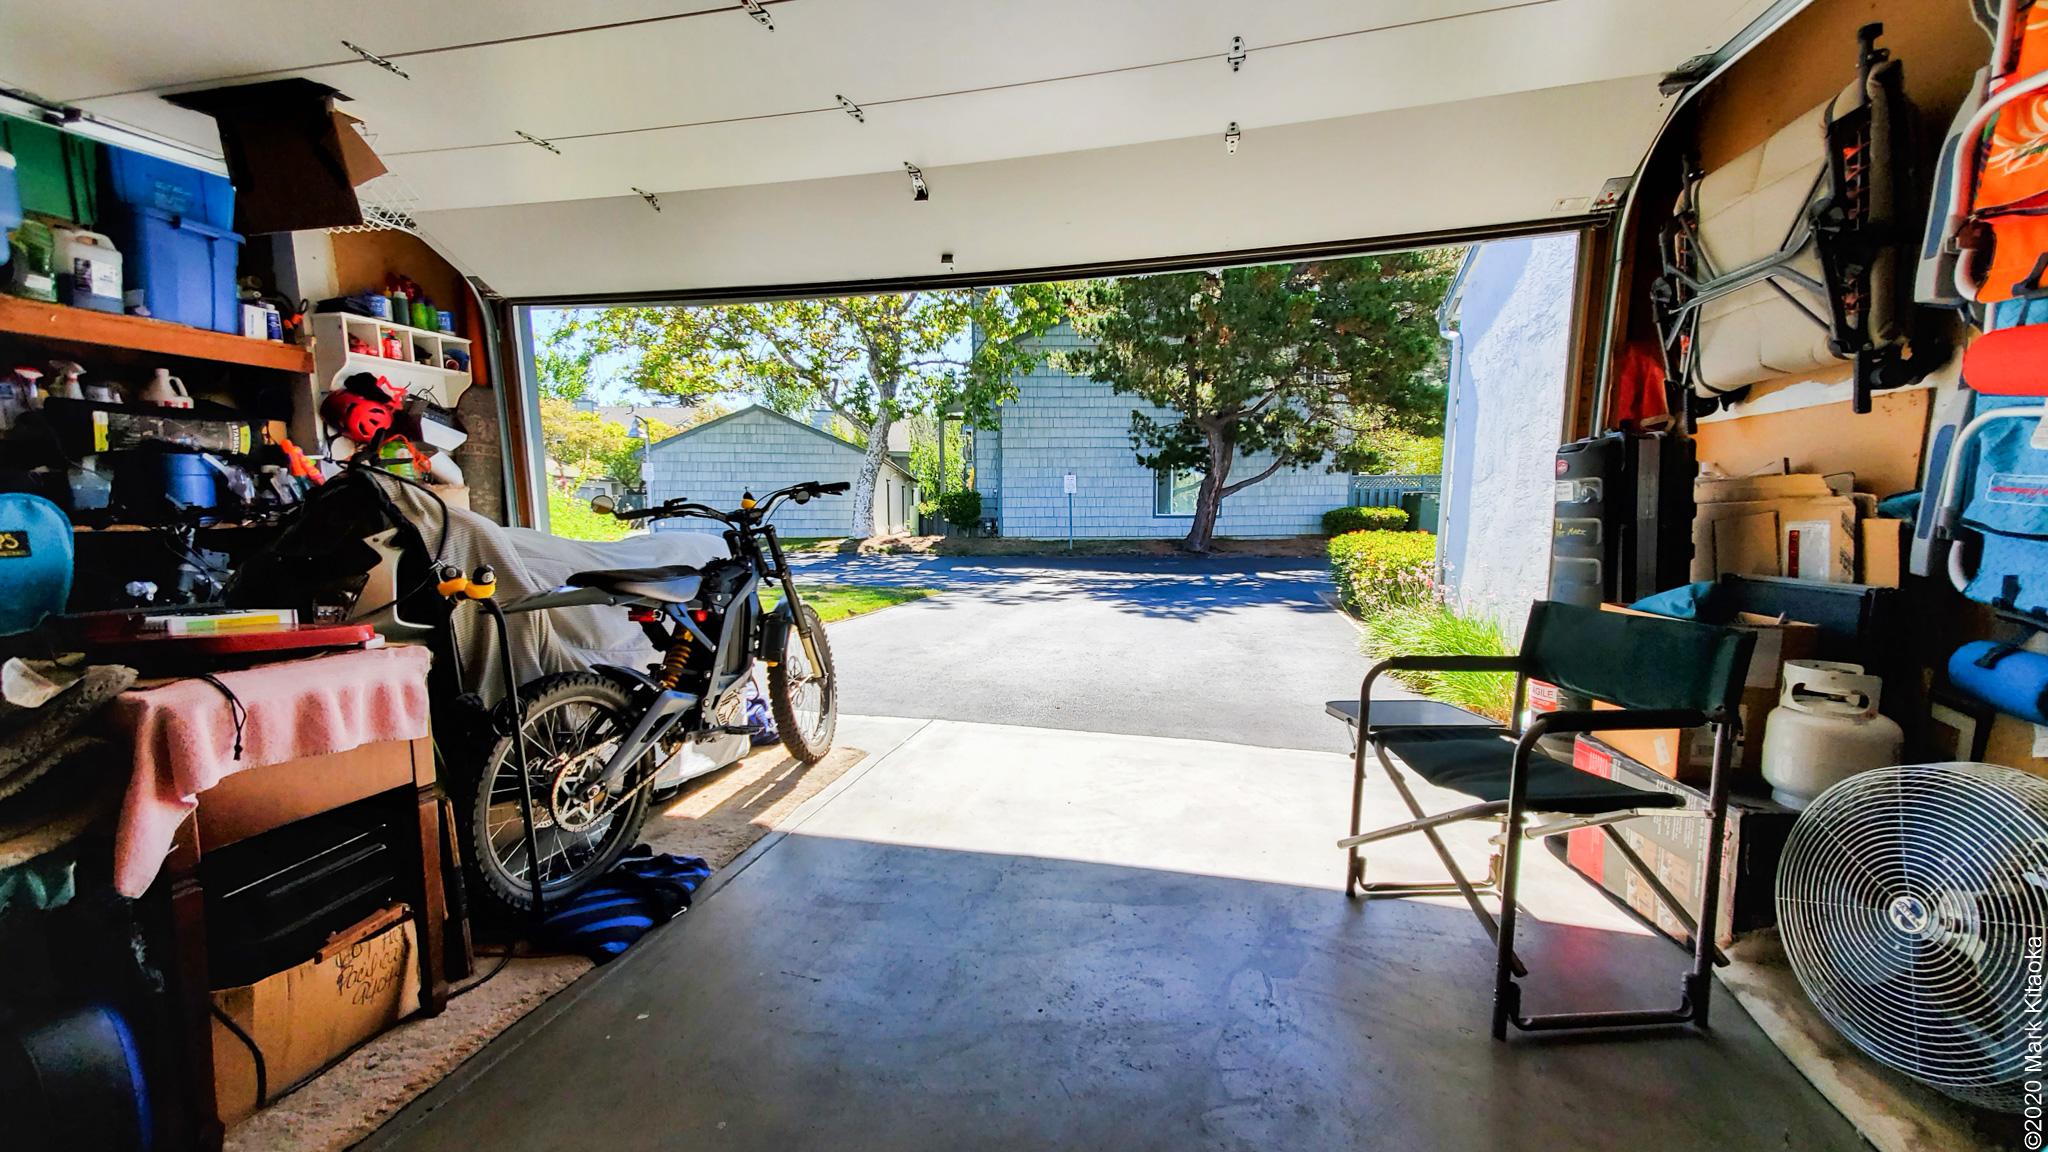 Mark's Kitaoka's garage